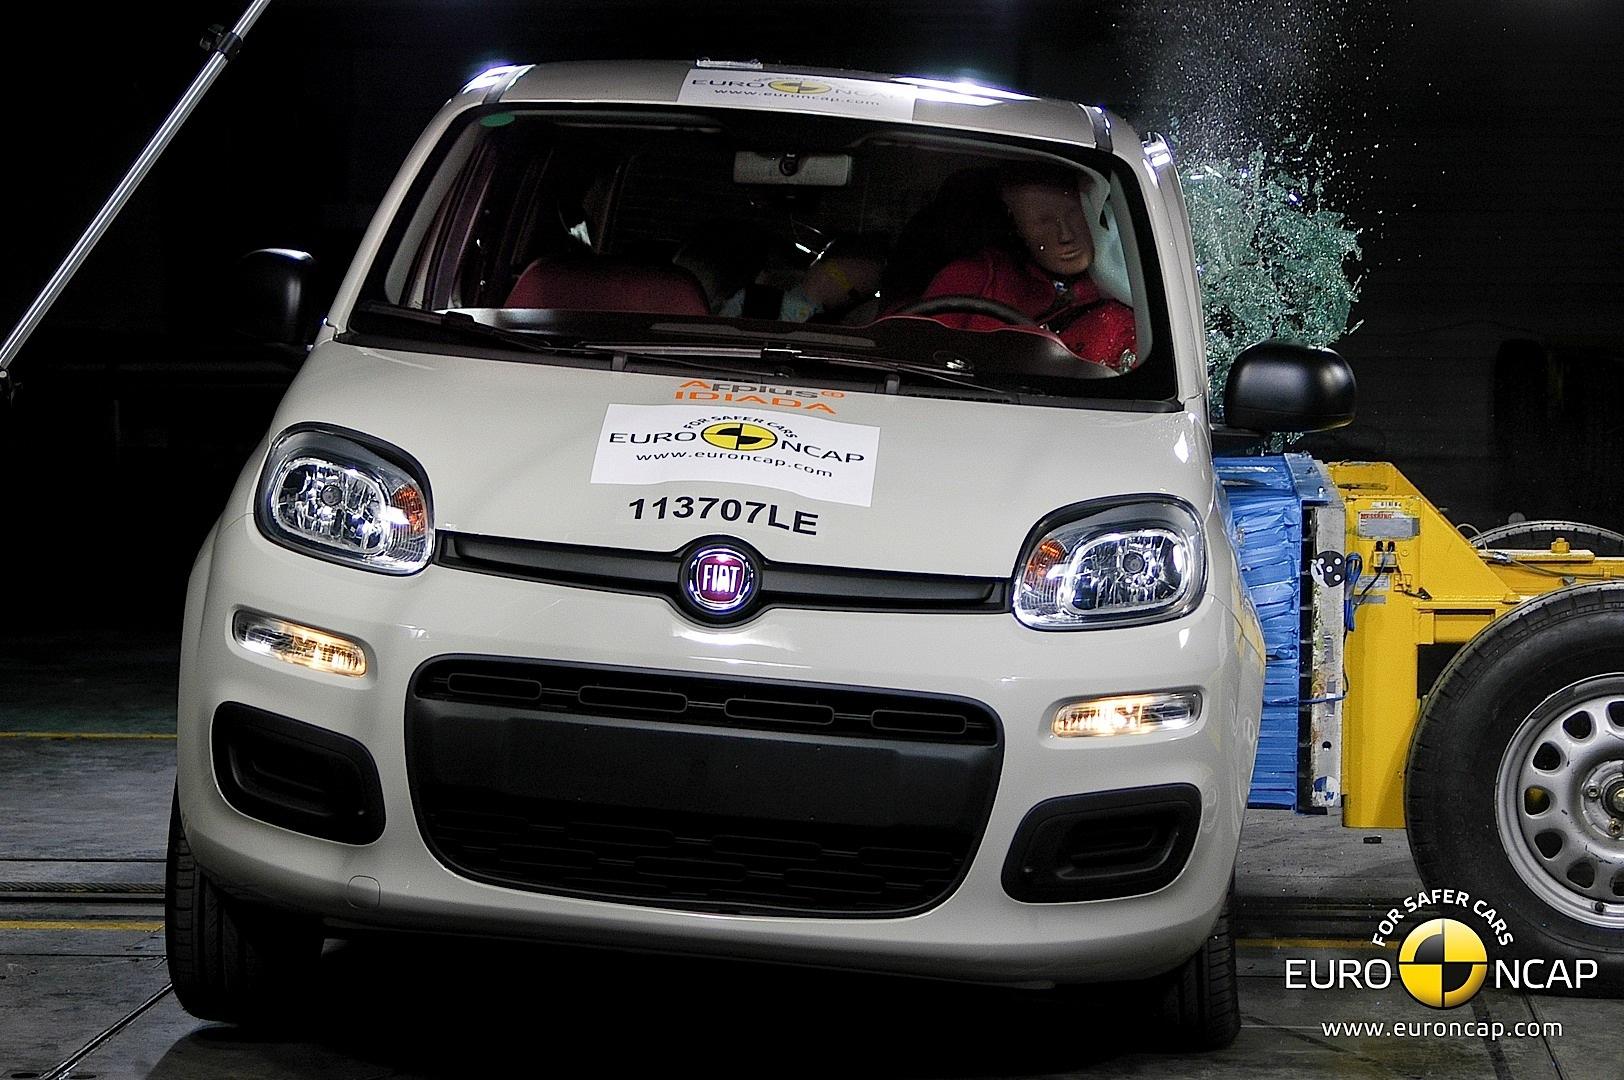 2012 fiat panda gets four star euro ncap rating autoevolution. Black Bedroom Furniture Sets. Home Design Ideas